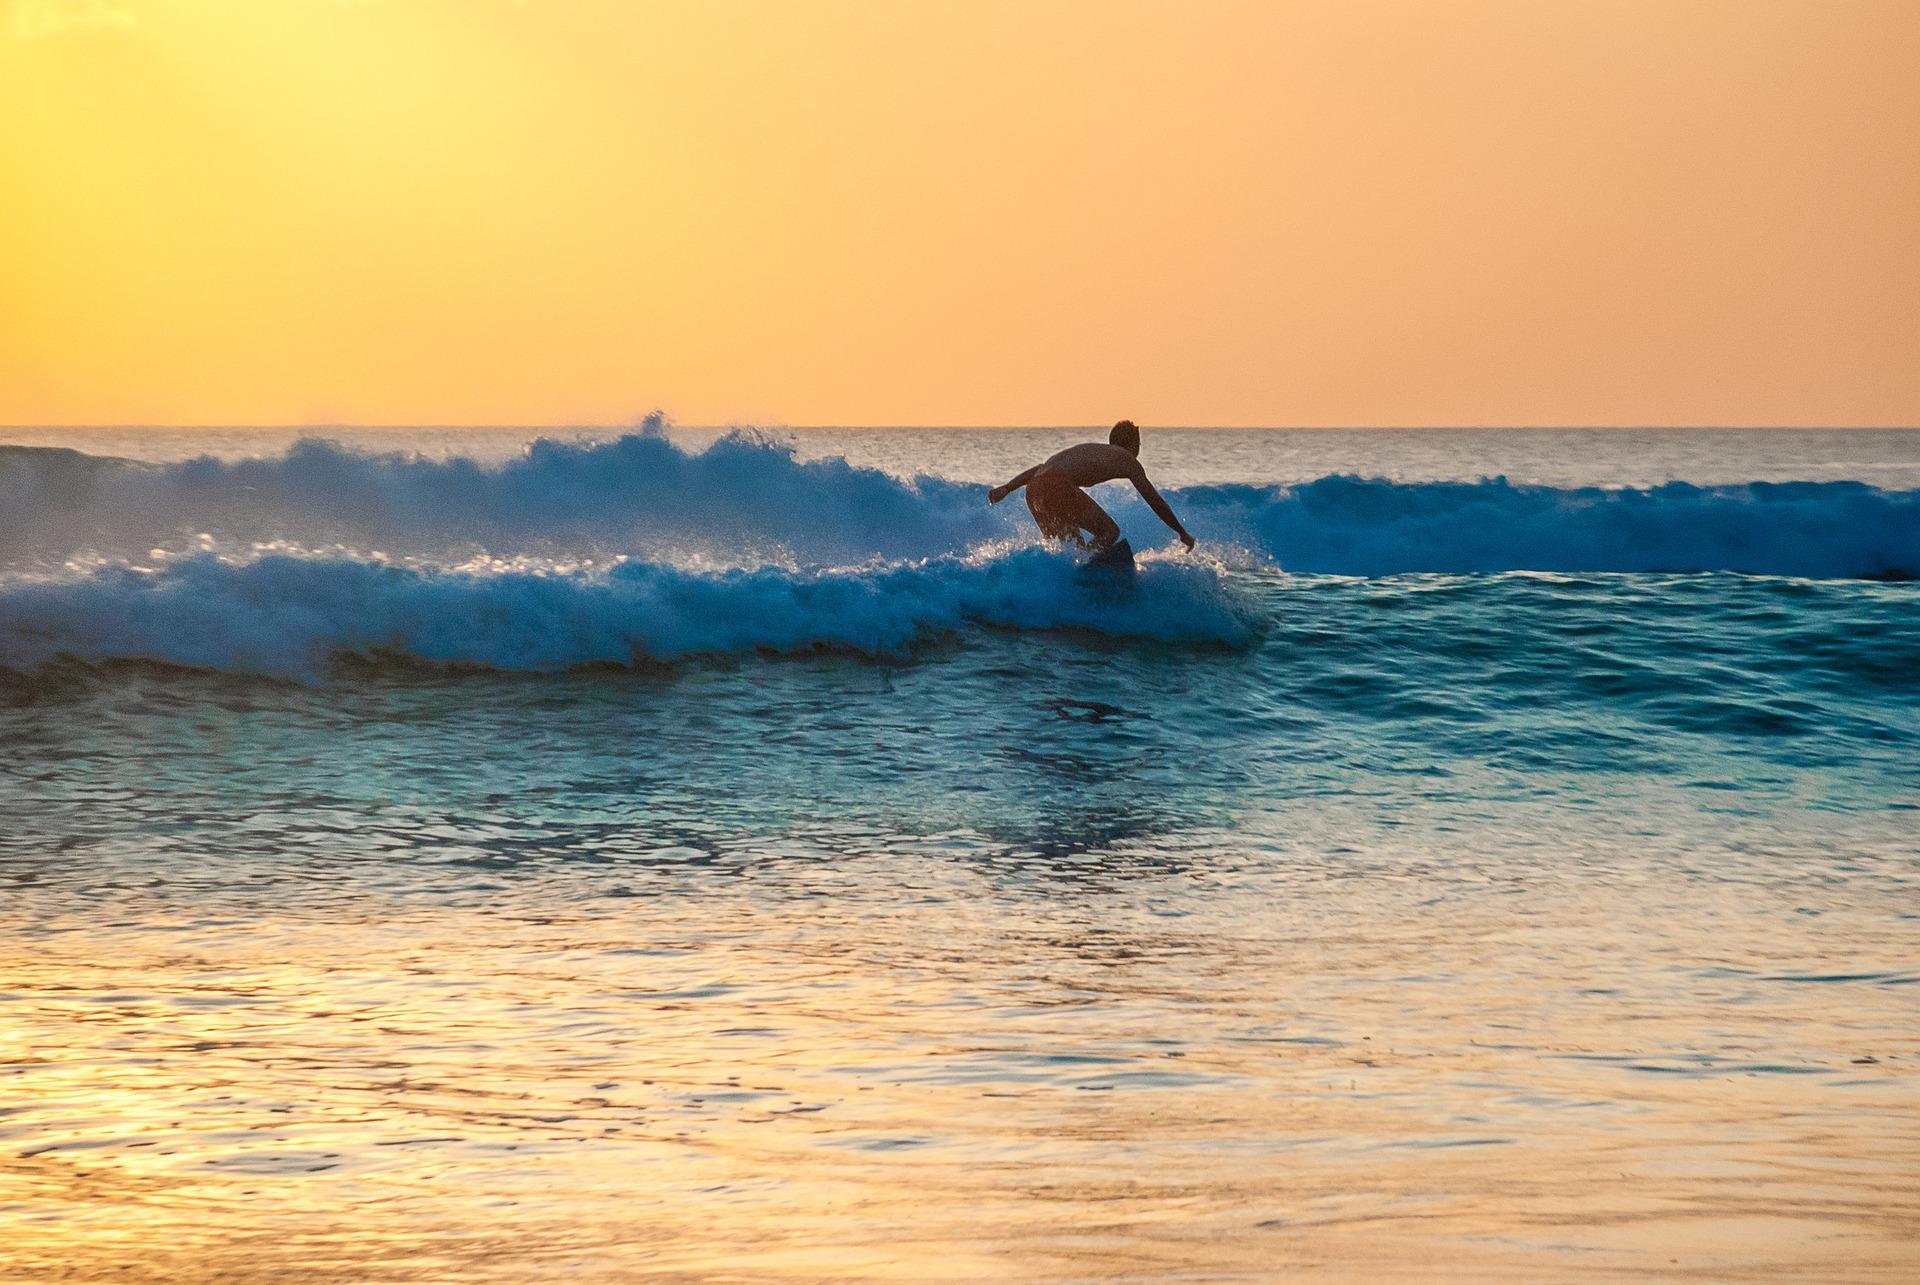 Welle surfen